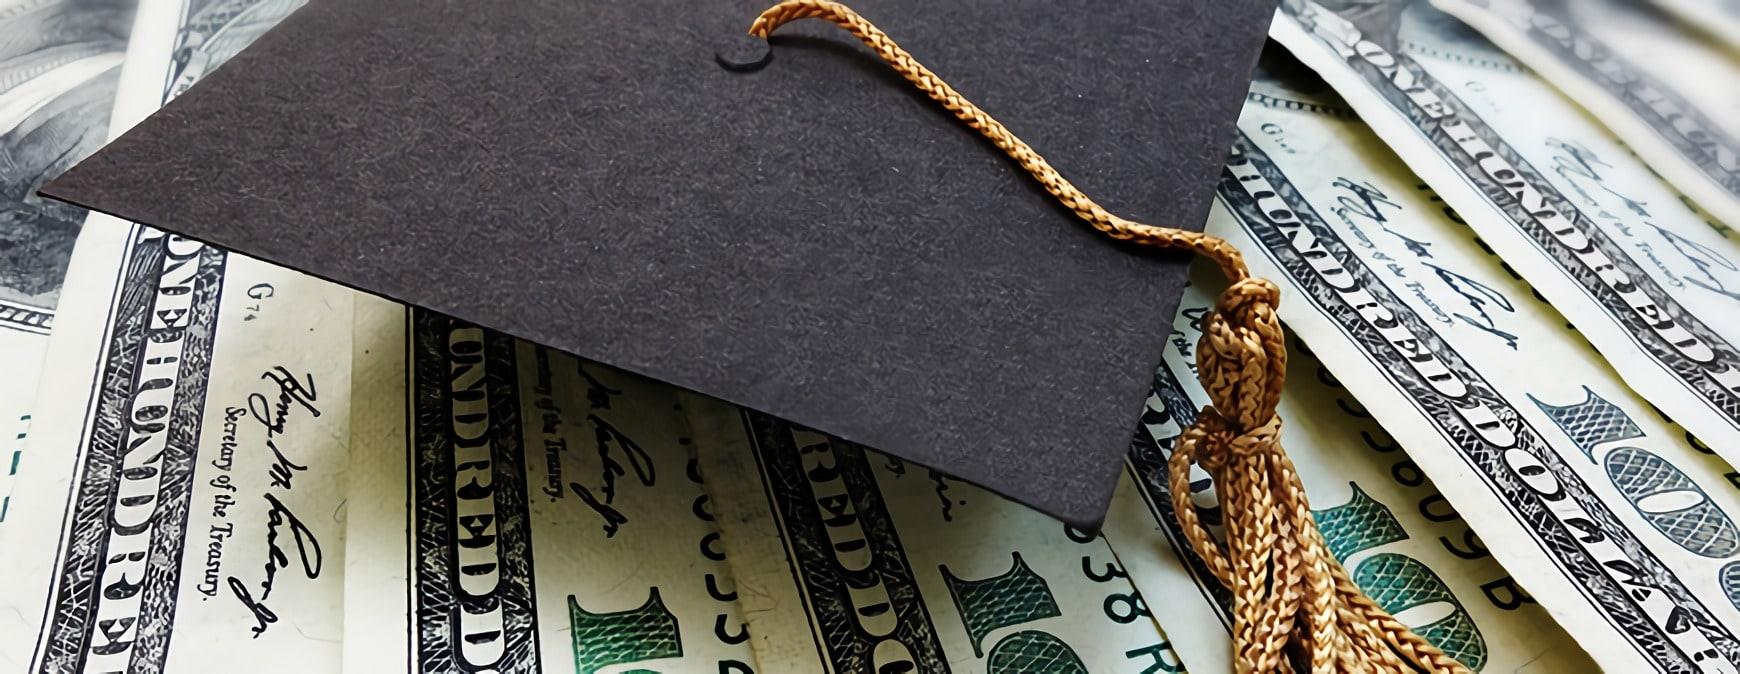 scholarship and money